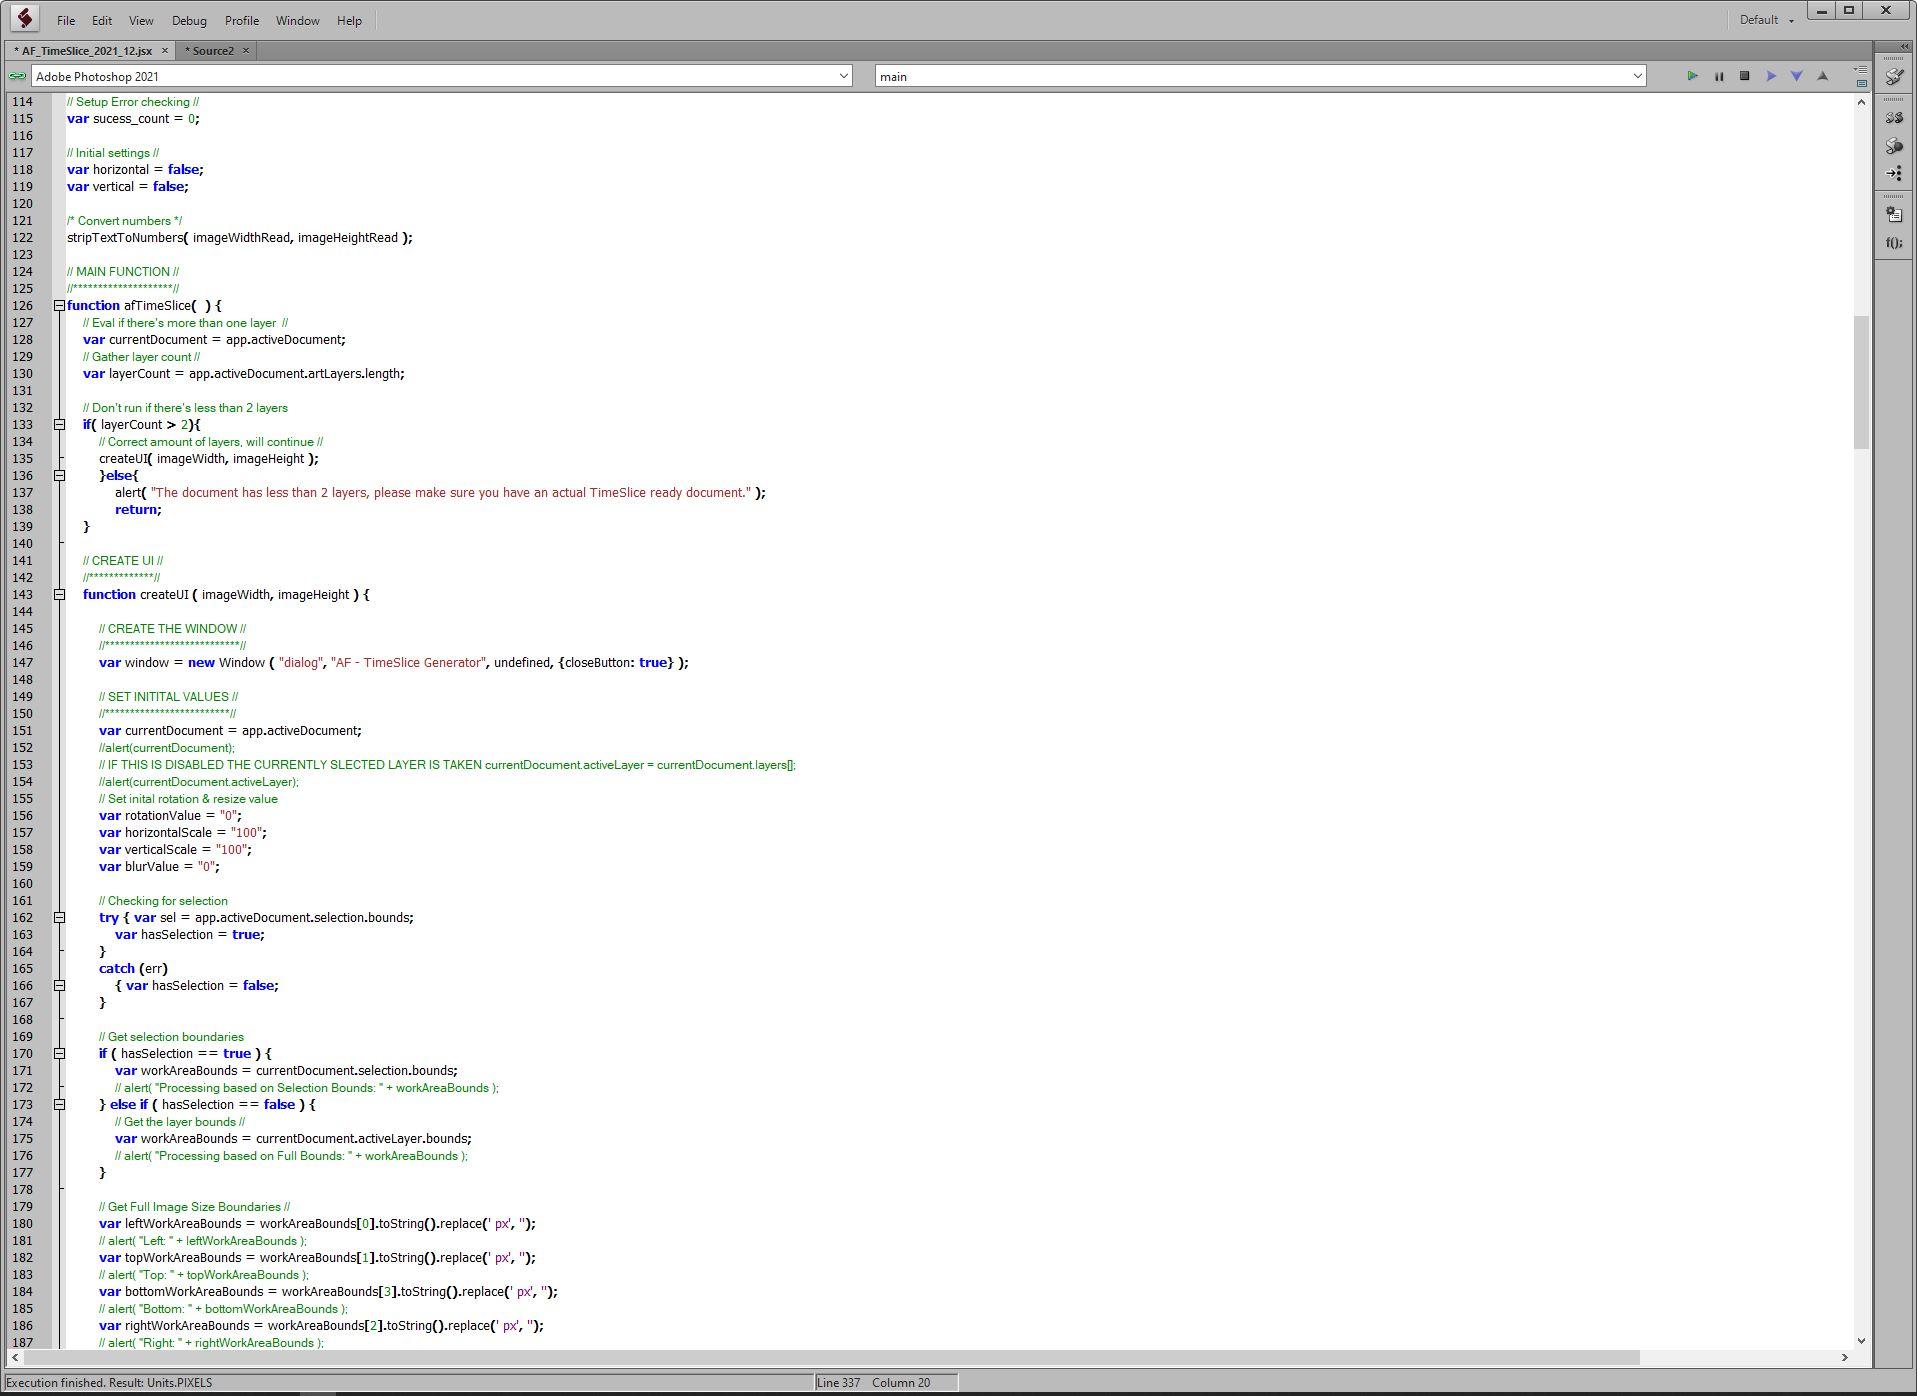 TimeSlice-Script - Scripting